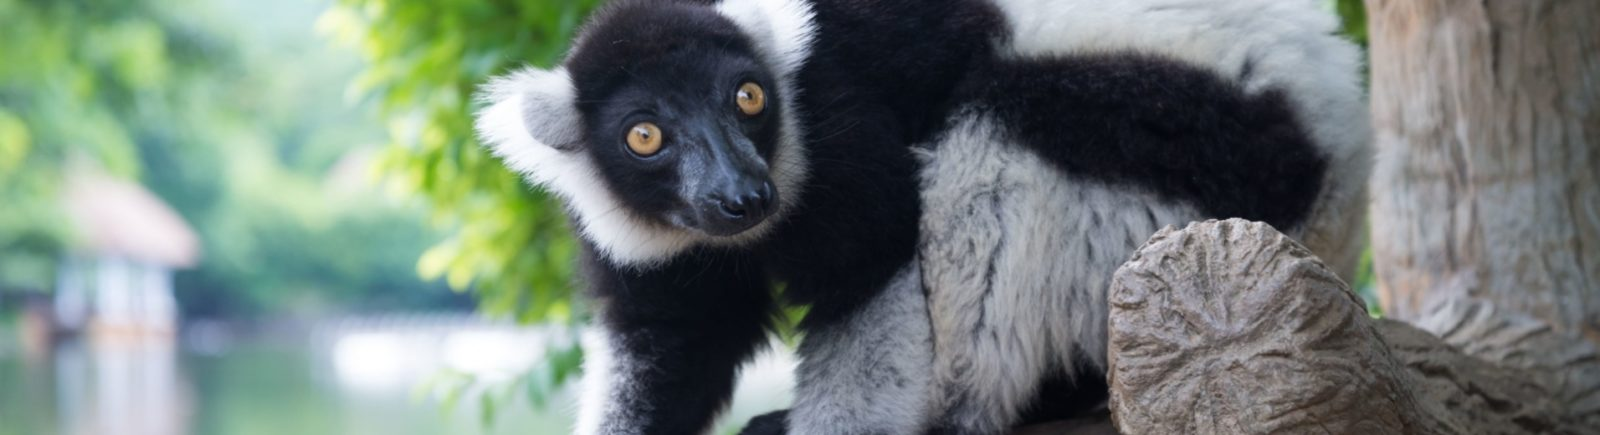 lemurien-andasibe-INDRI INDRI tour operator madagascar